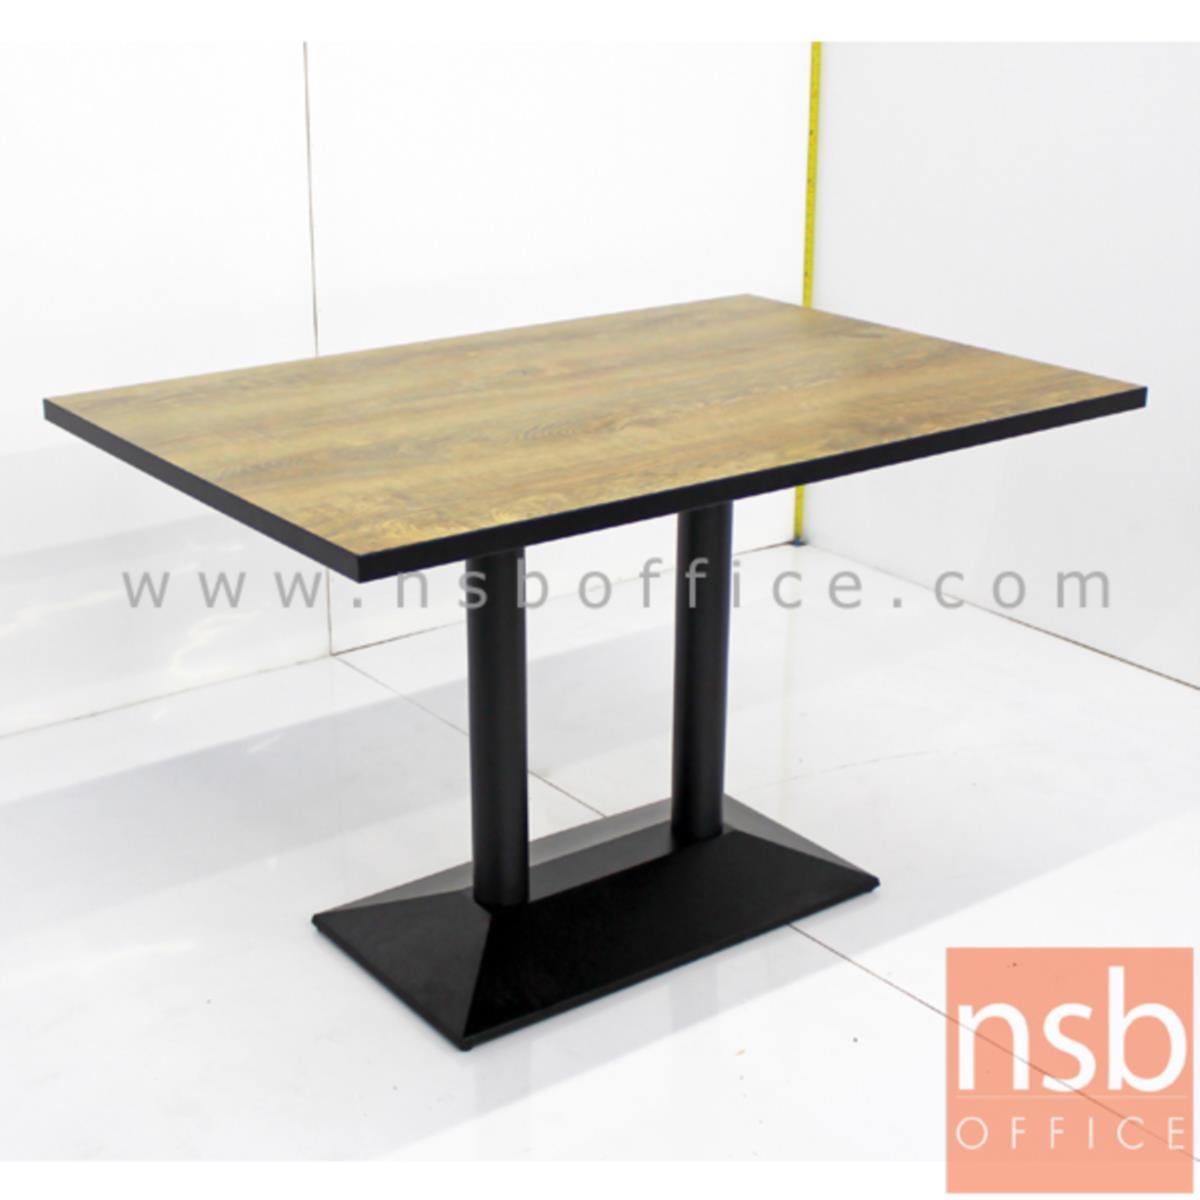 A14A174:โต๊ะบาร์ COFFEE รุ่น H-CF48 ขนาด 120W cm. ขาเหล็กฐานพีระมิดสีดำ